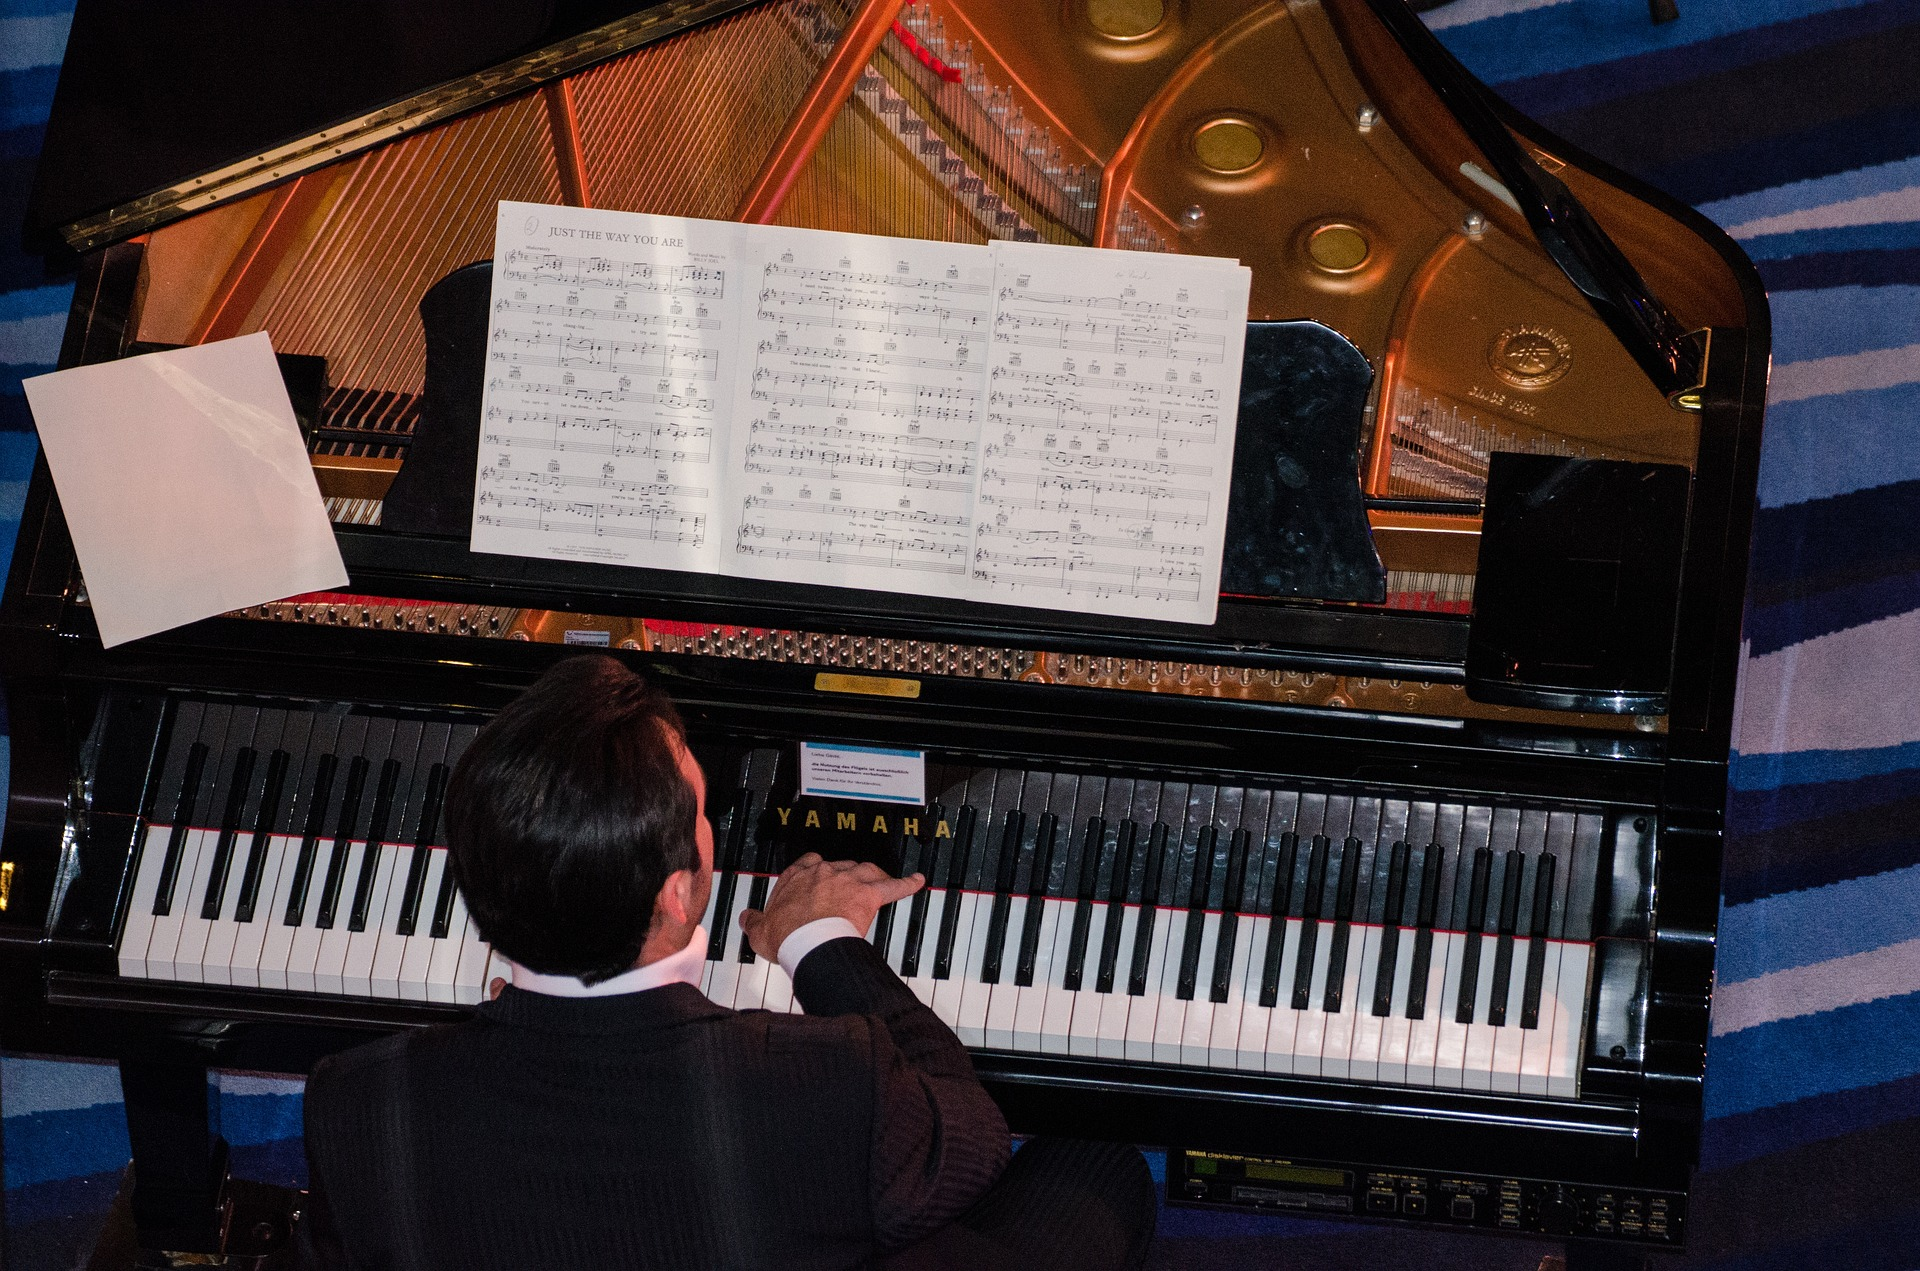 jouer du piano adulte